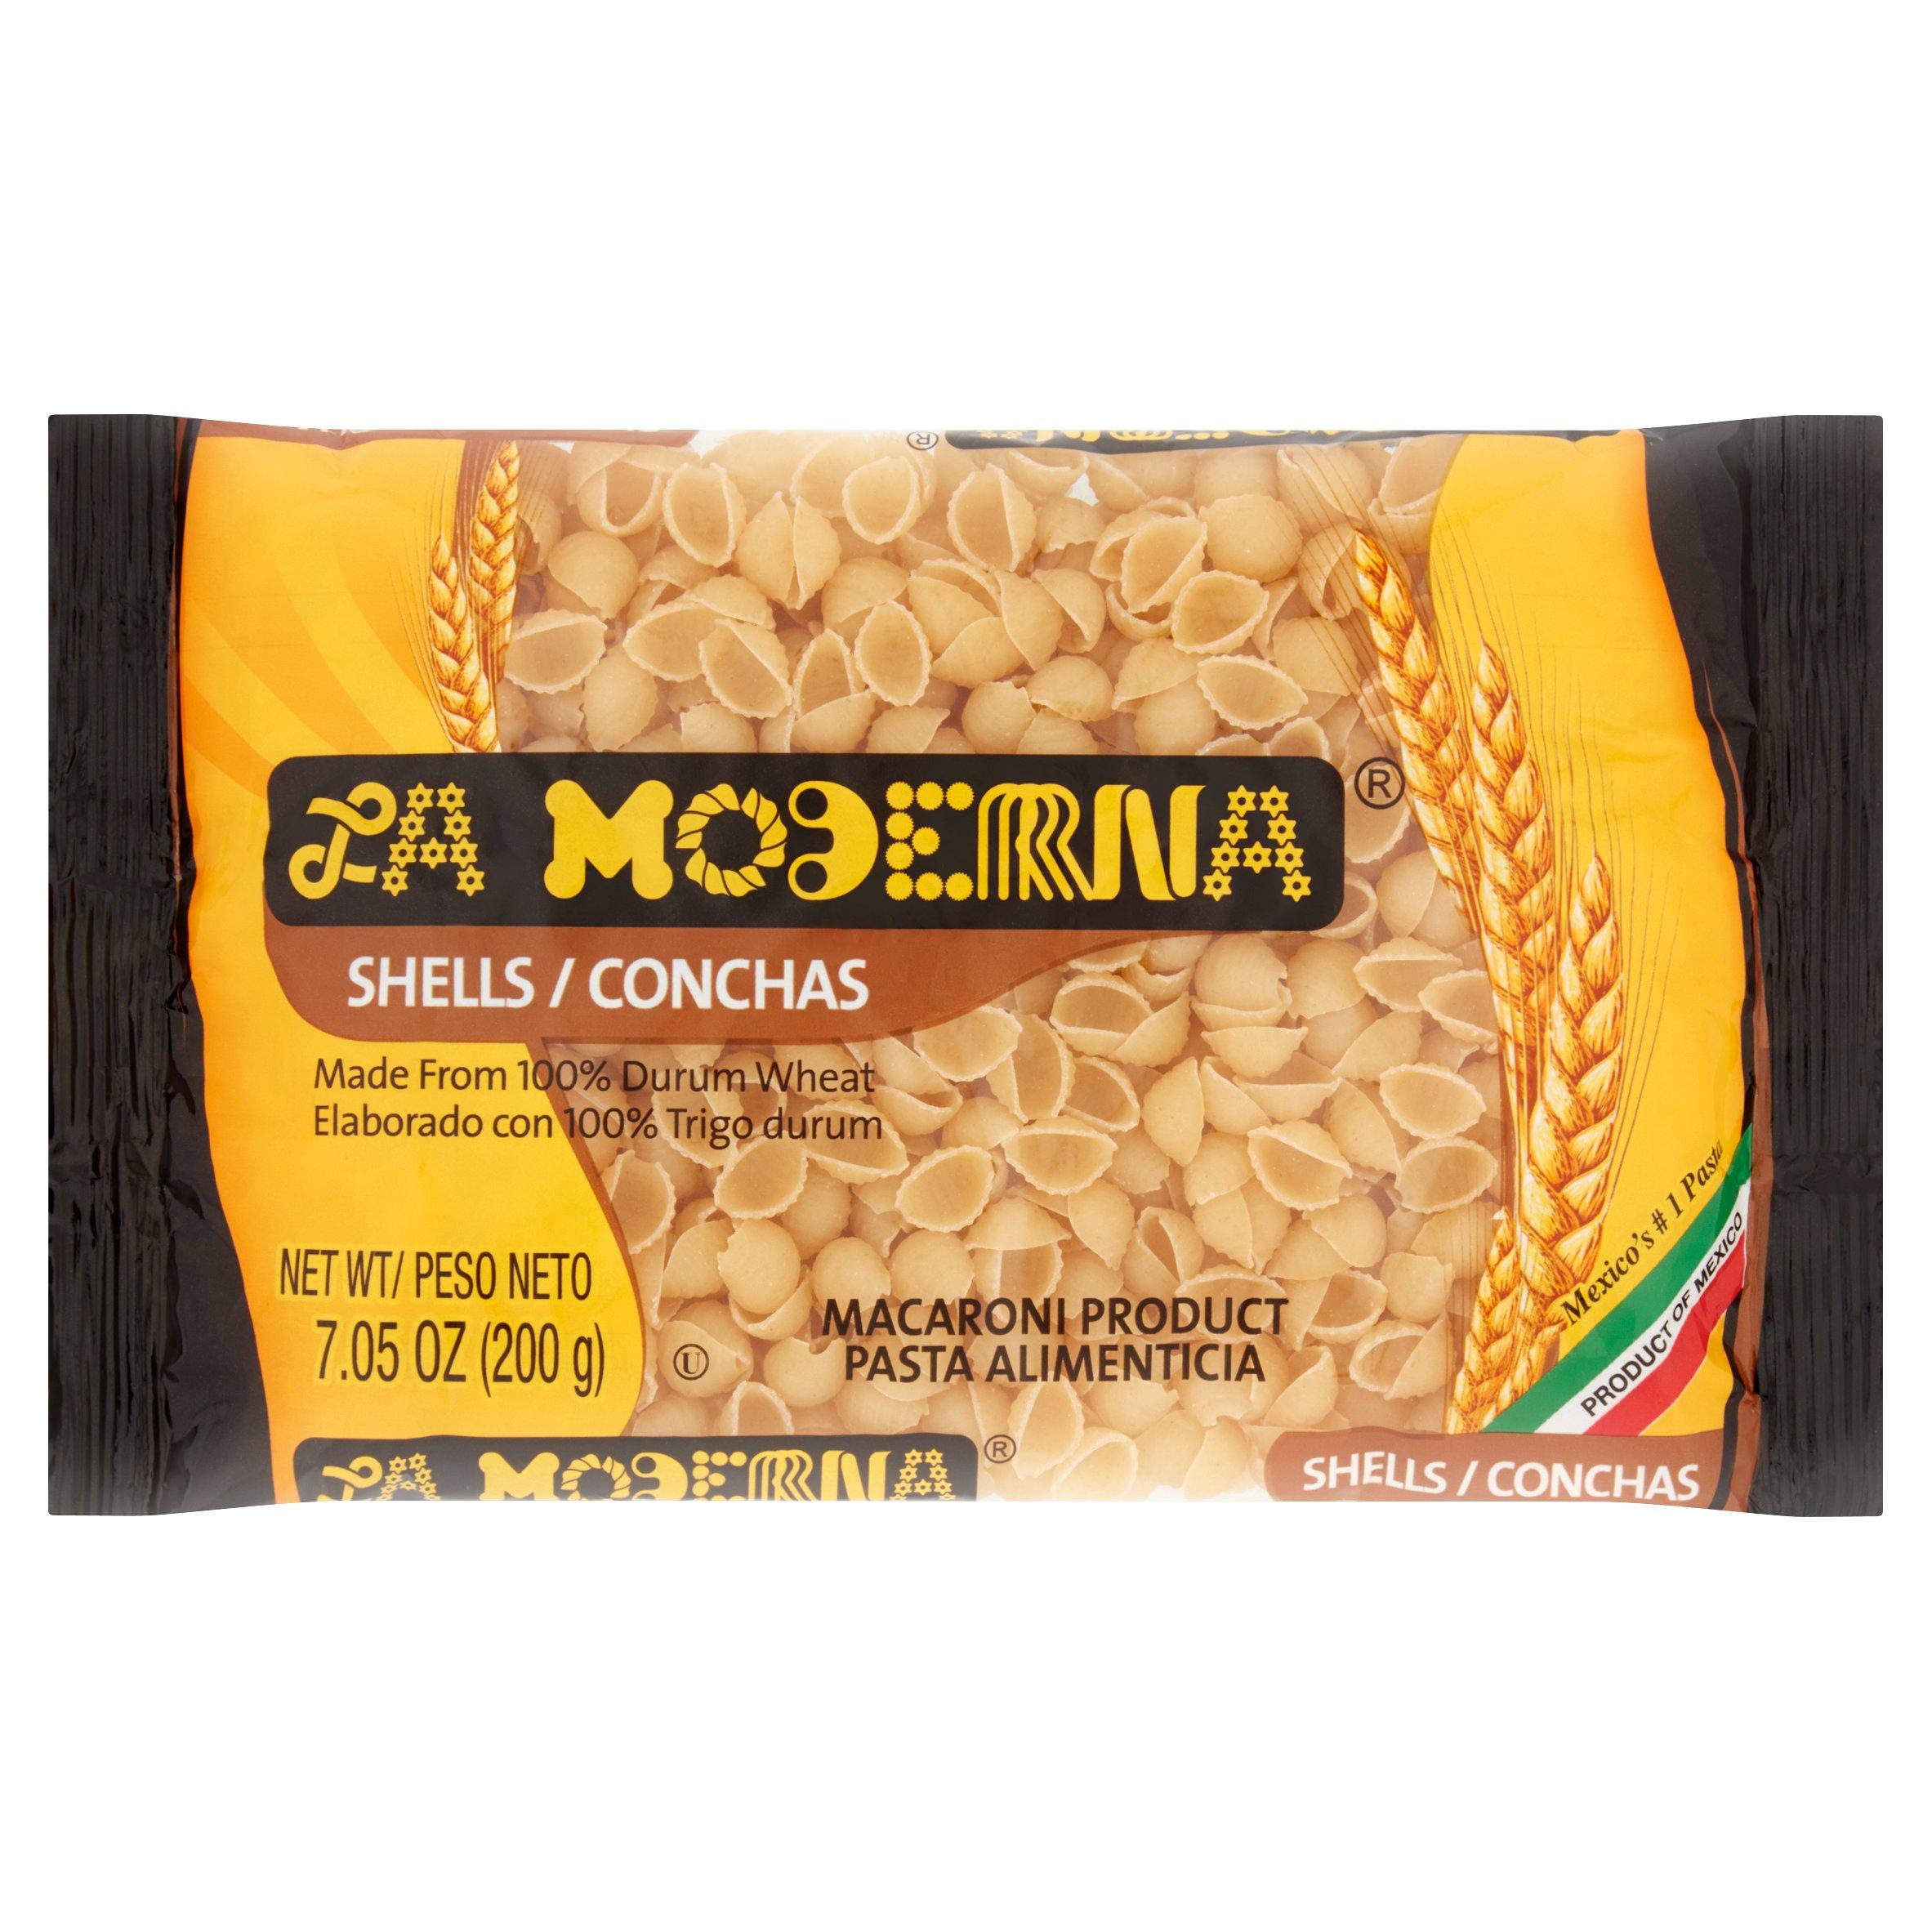 (5 Pack) La Moderna Shells Macaroni Pasta, 7.05 oz